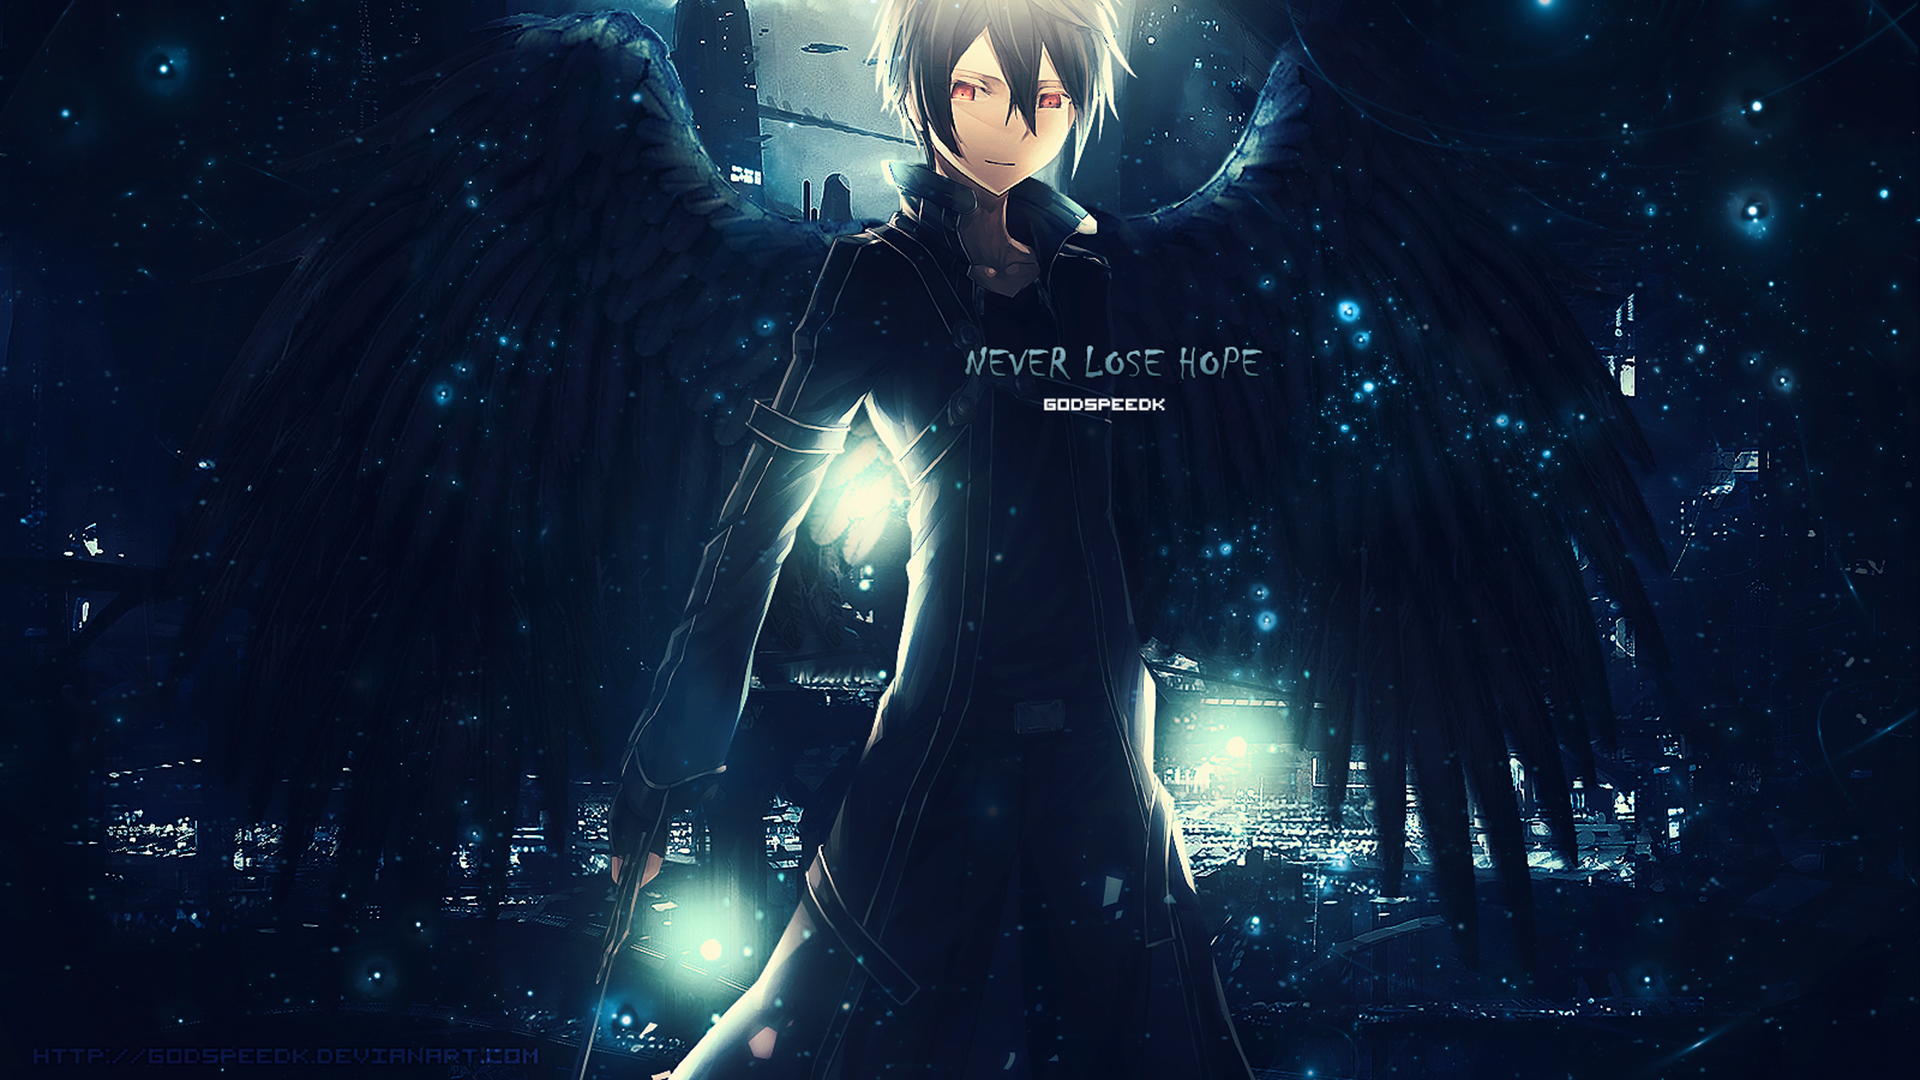 Kirto - Never Lose Hope (SAO Wallpaper